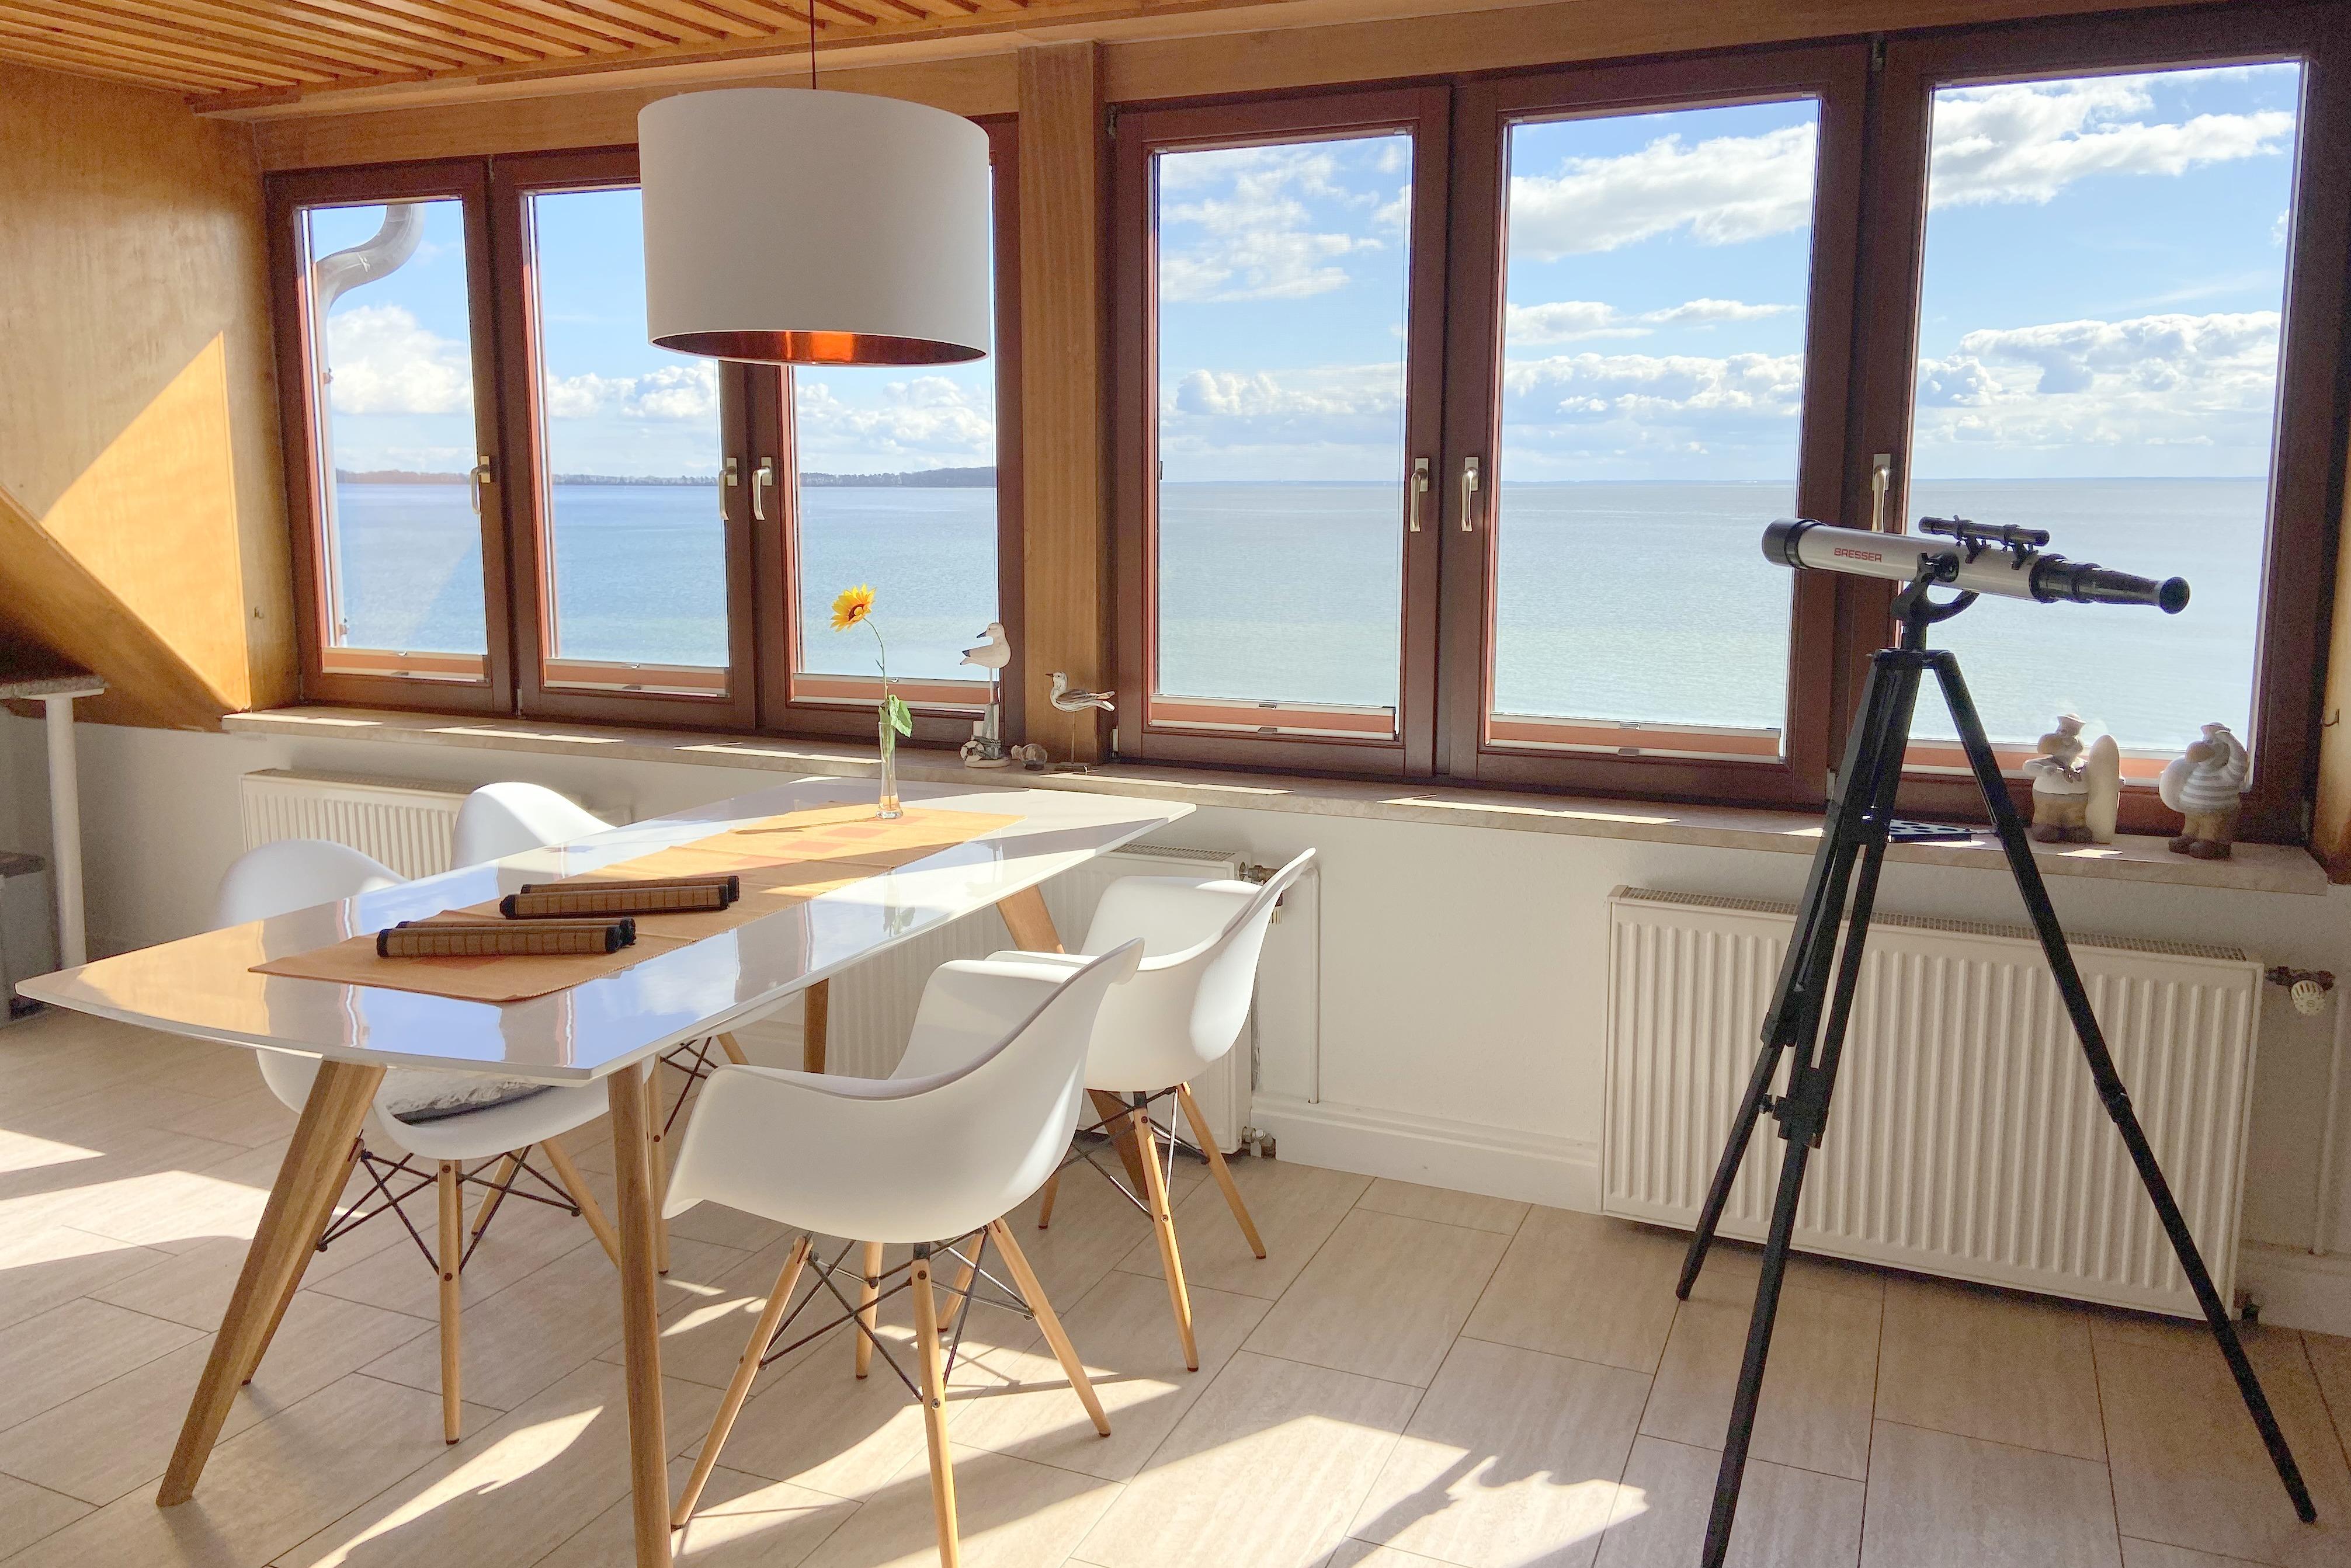 ferienwohnung-panoramadeck-seeblick